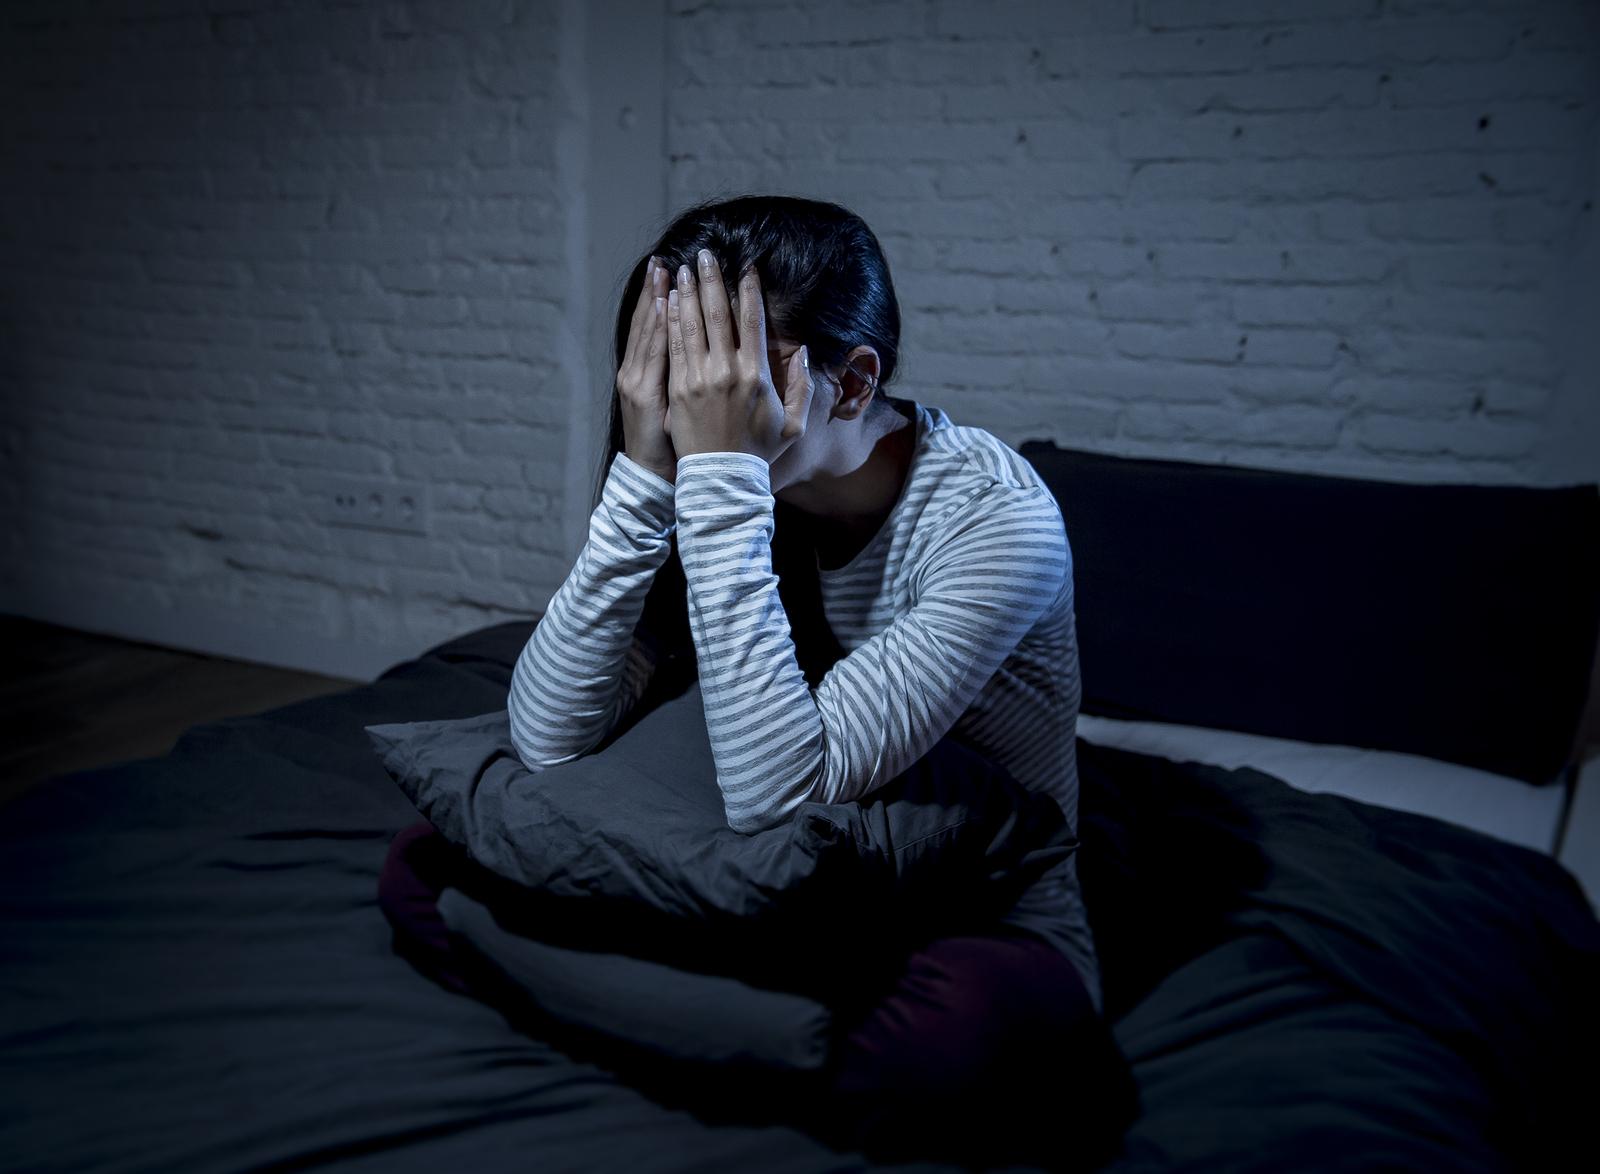 problemy ze snem bezsenność nadmierna senność dieta na sen zioła na sen